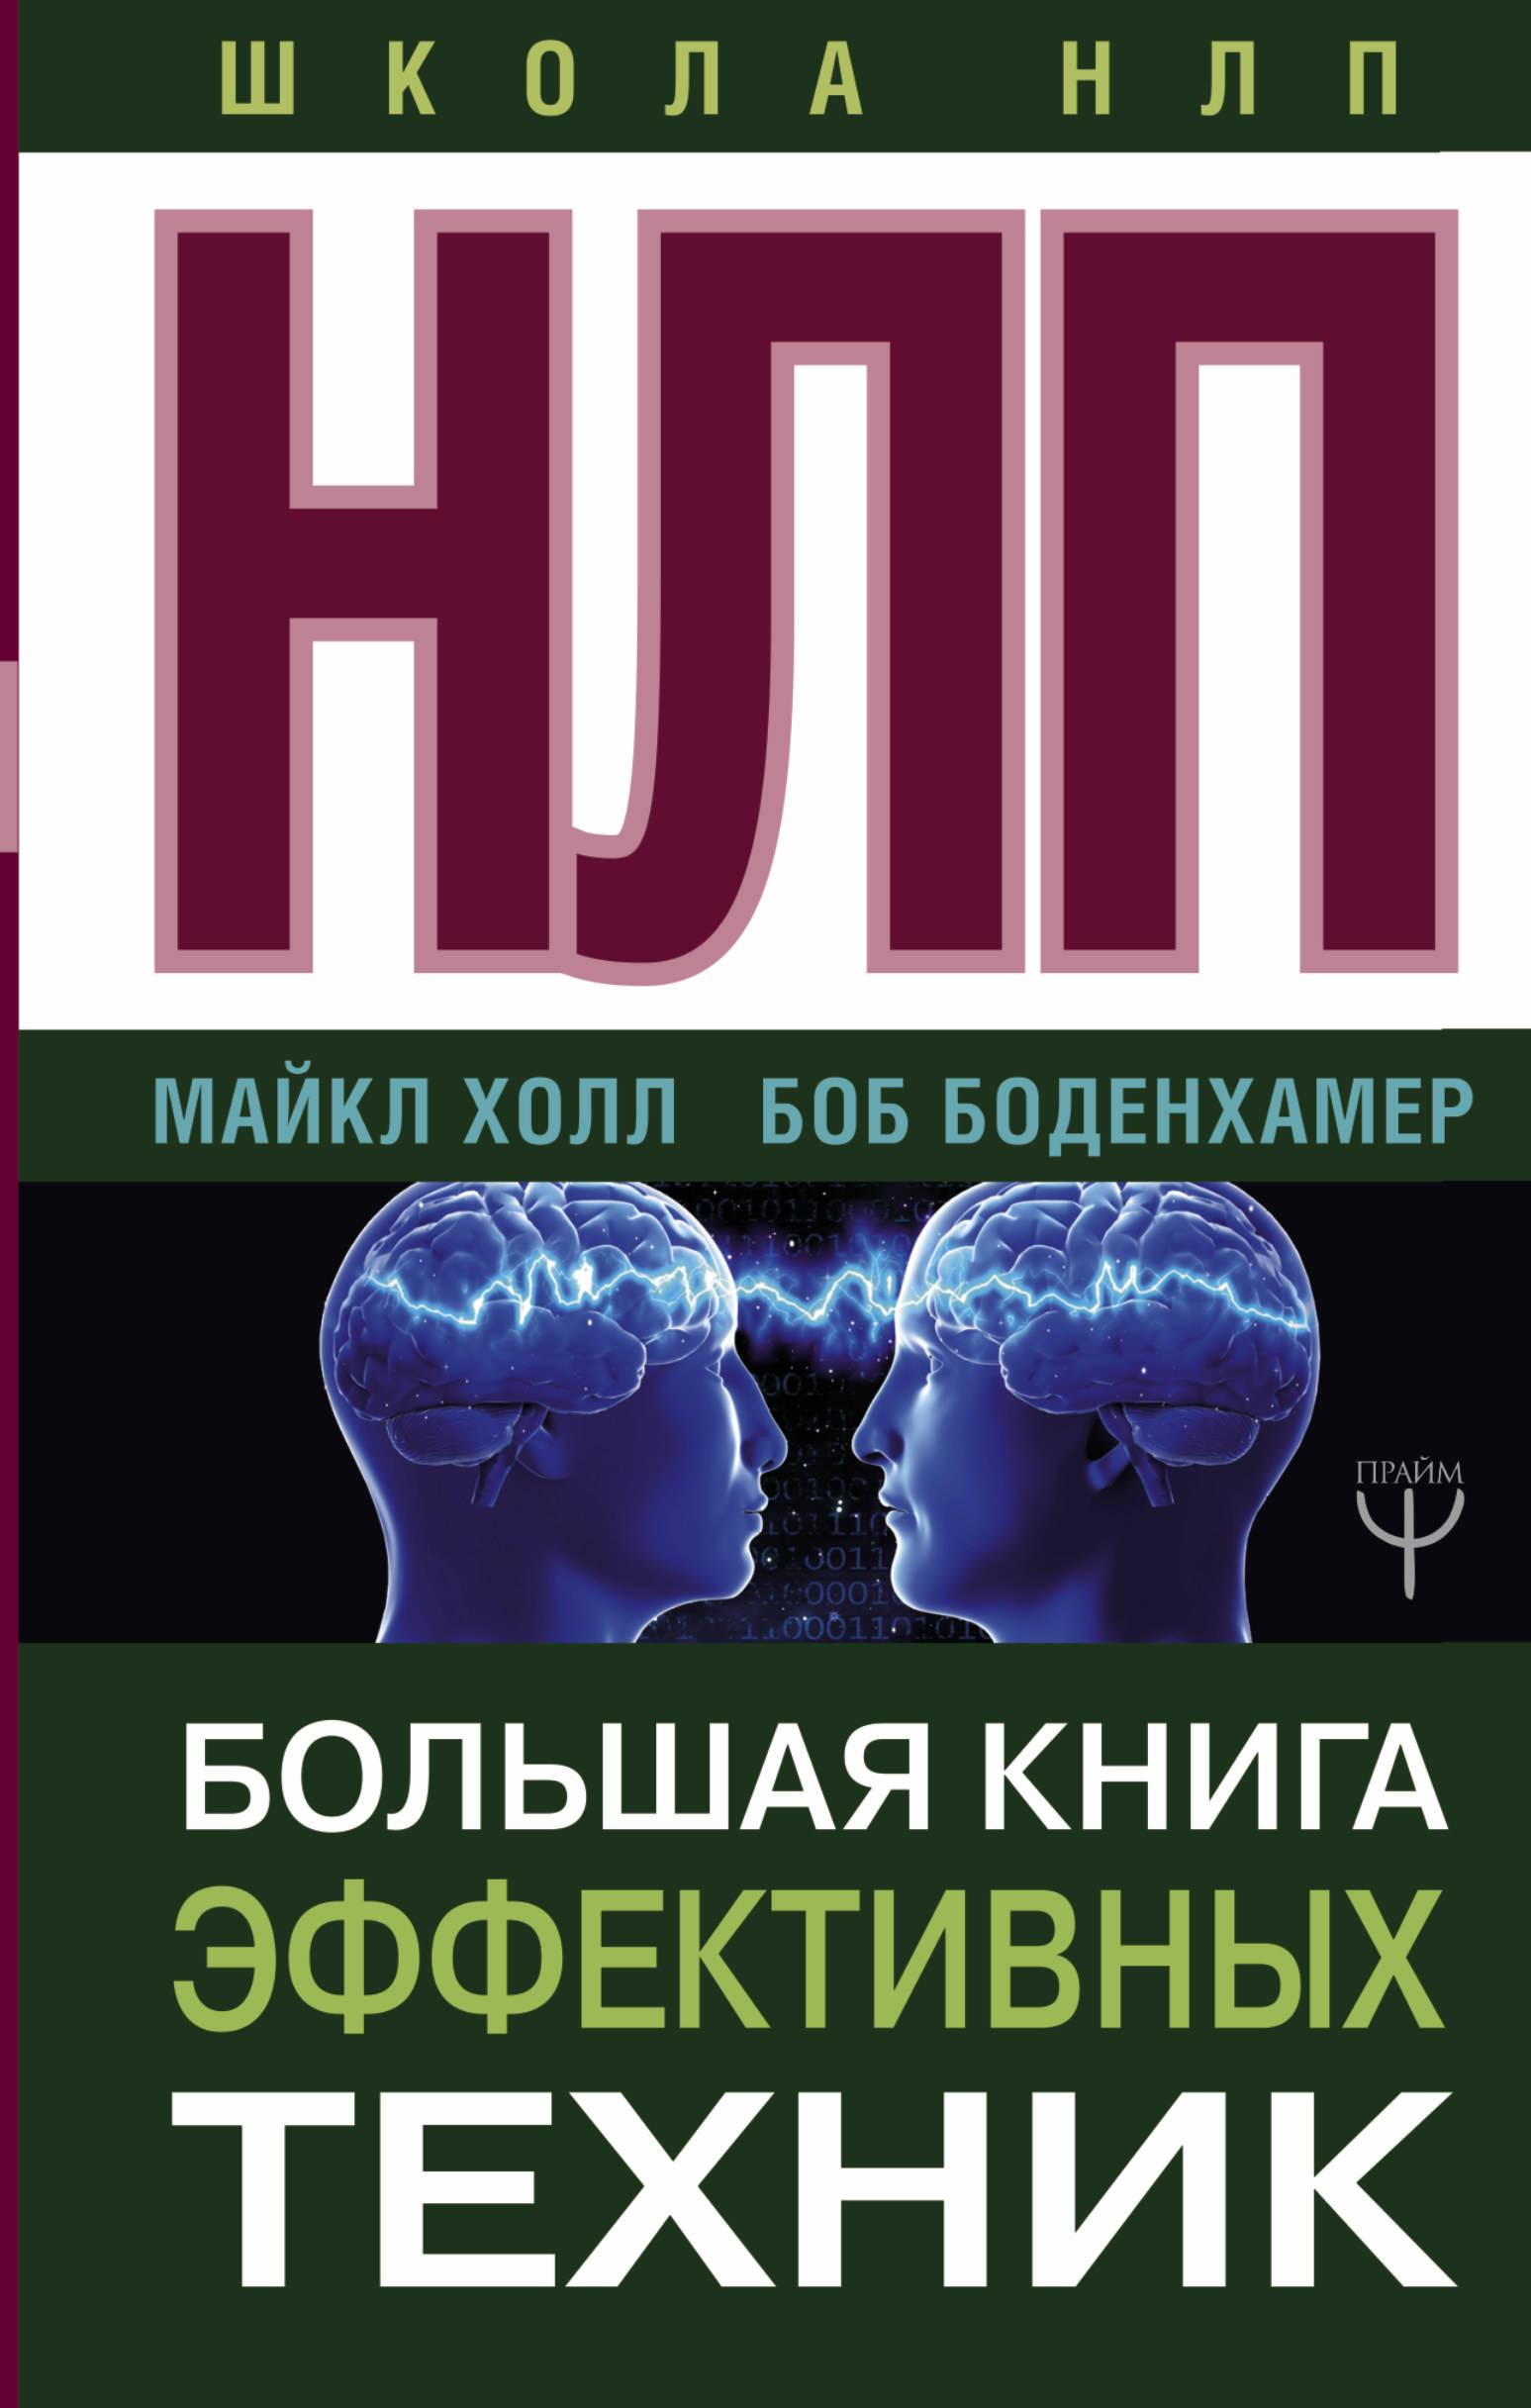 все цены на Майкл Холл, Боб Боденхамер НЛП. Большая книга эффективных техник онлайн